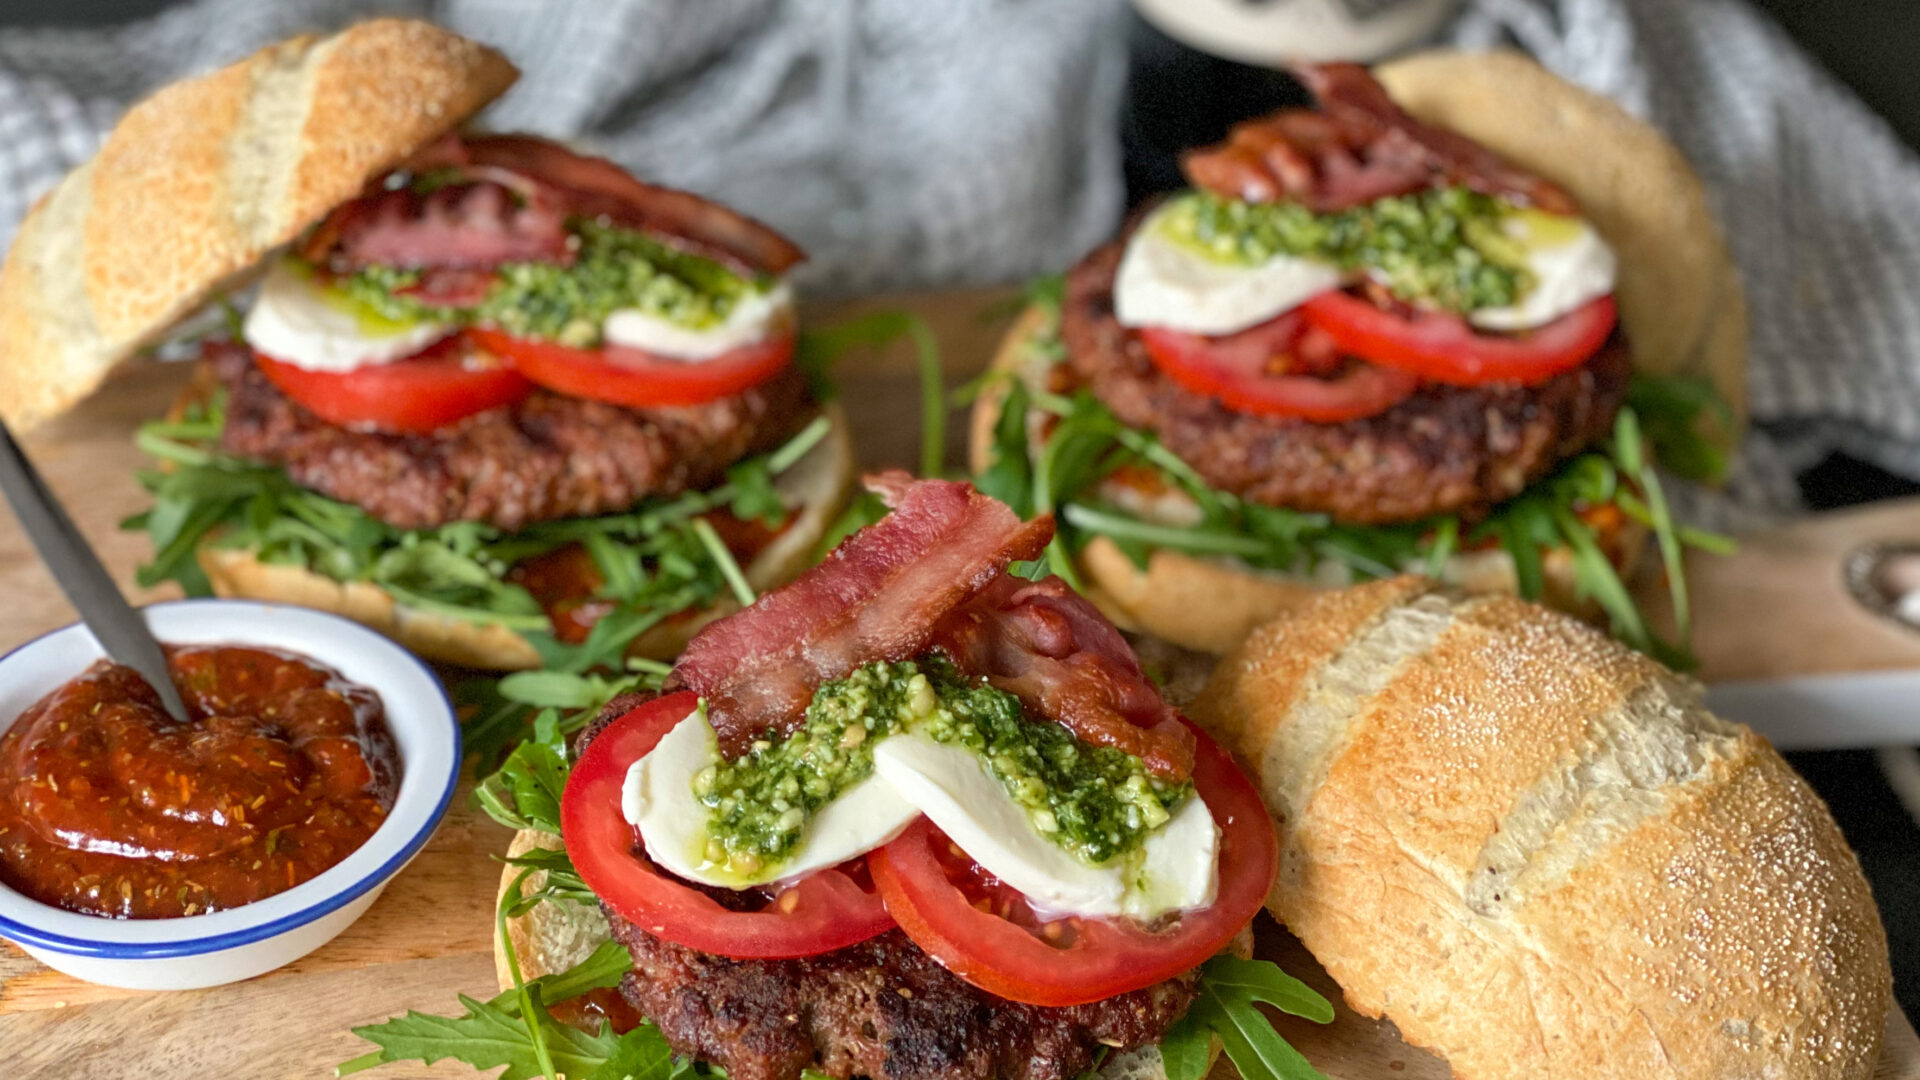 Italiaanse hamburger met kruidige ketchup